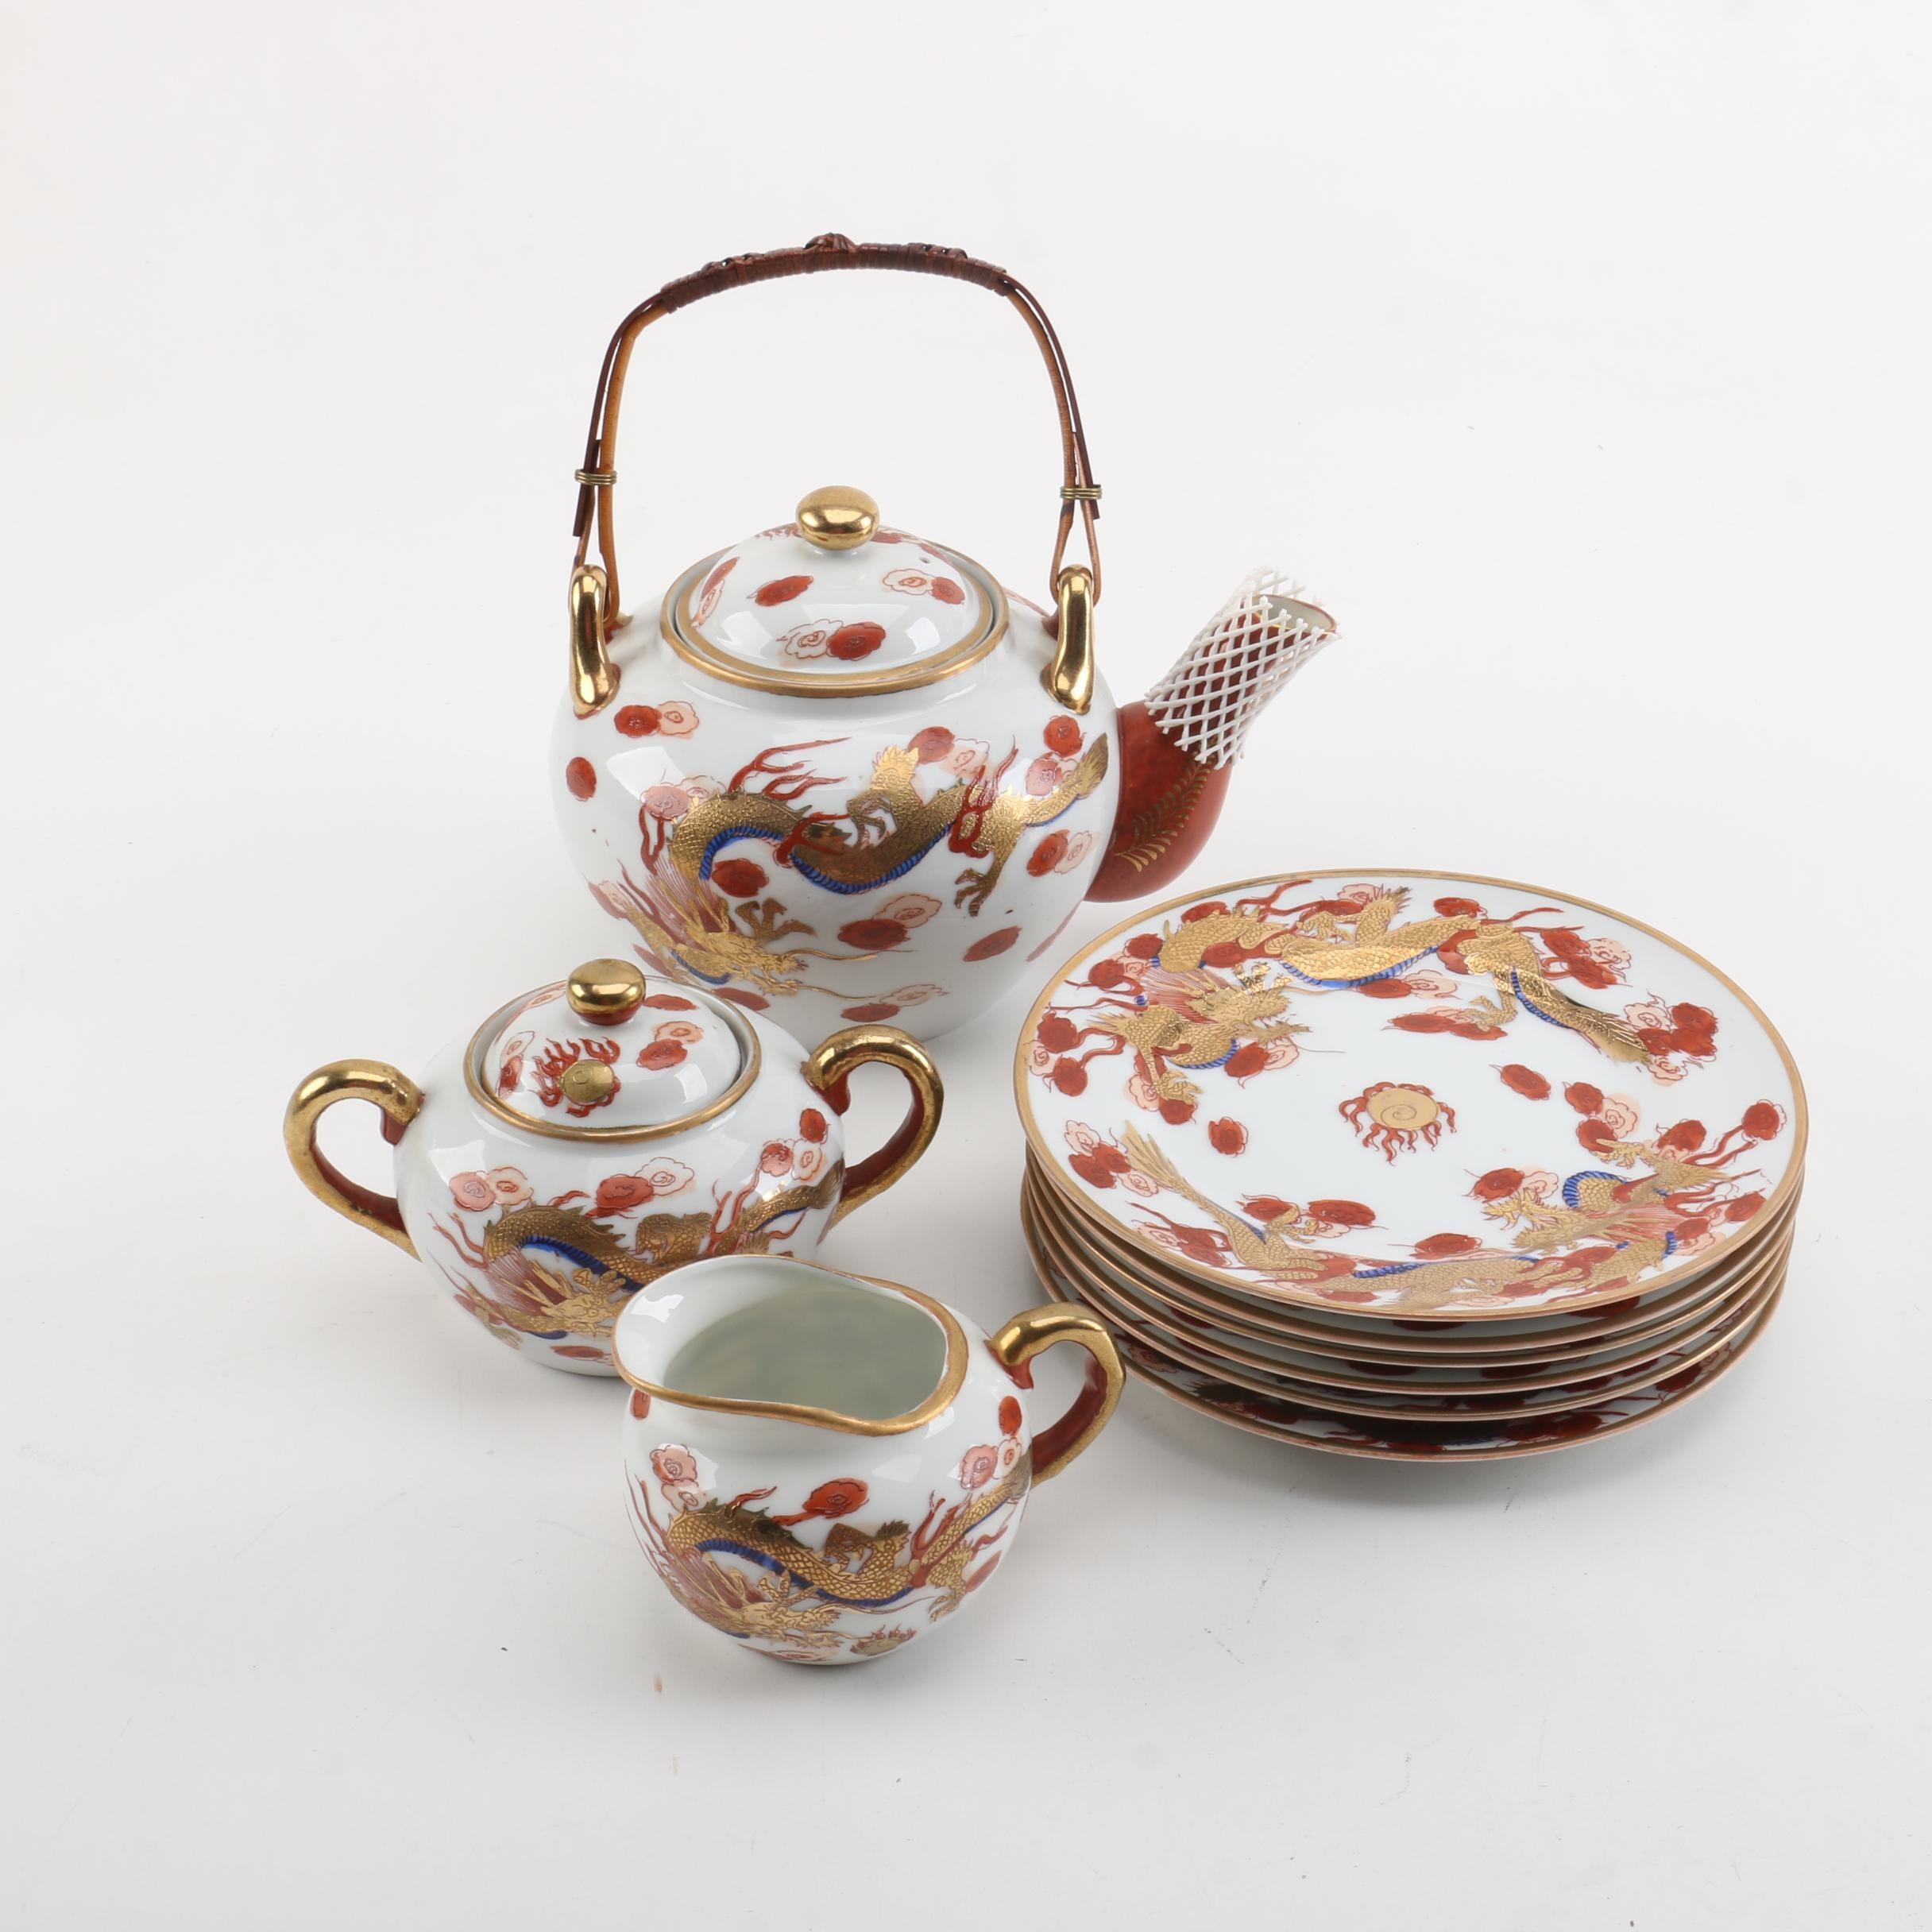 Hand-painted Japanese Porcelain Serveware